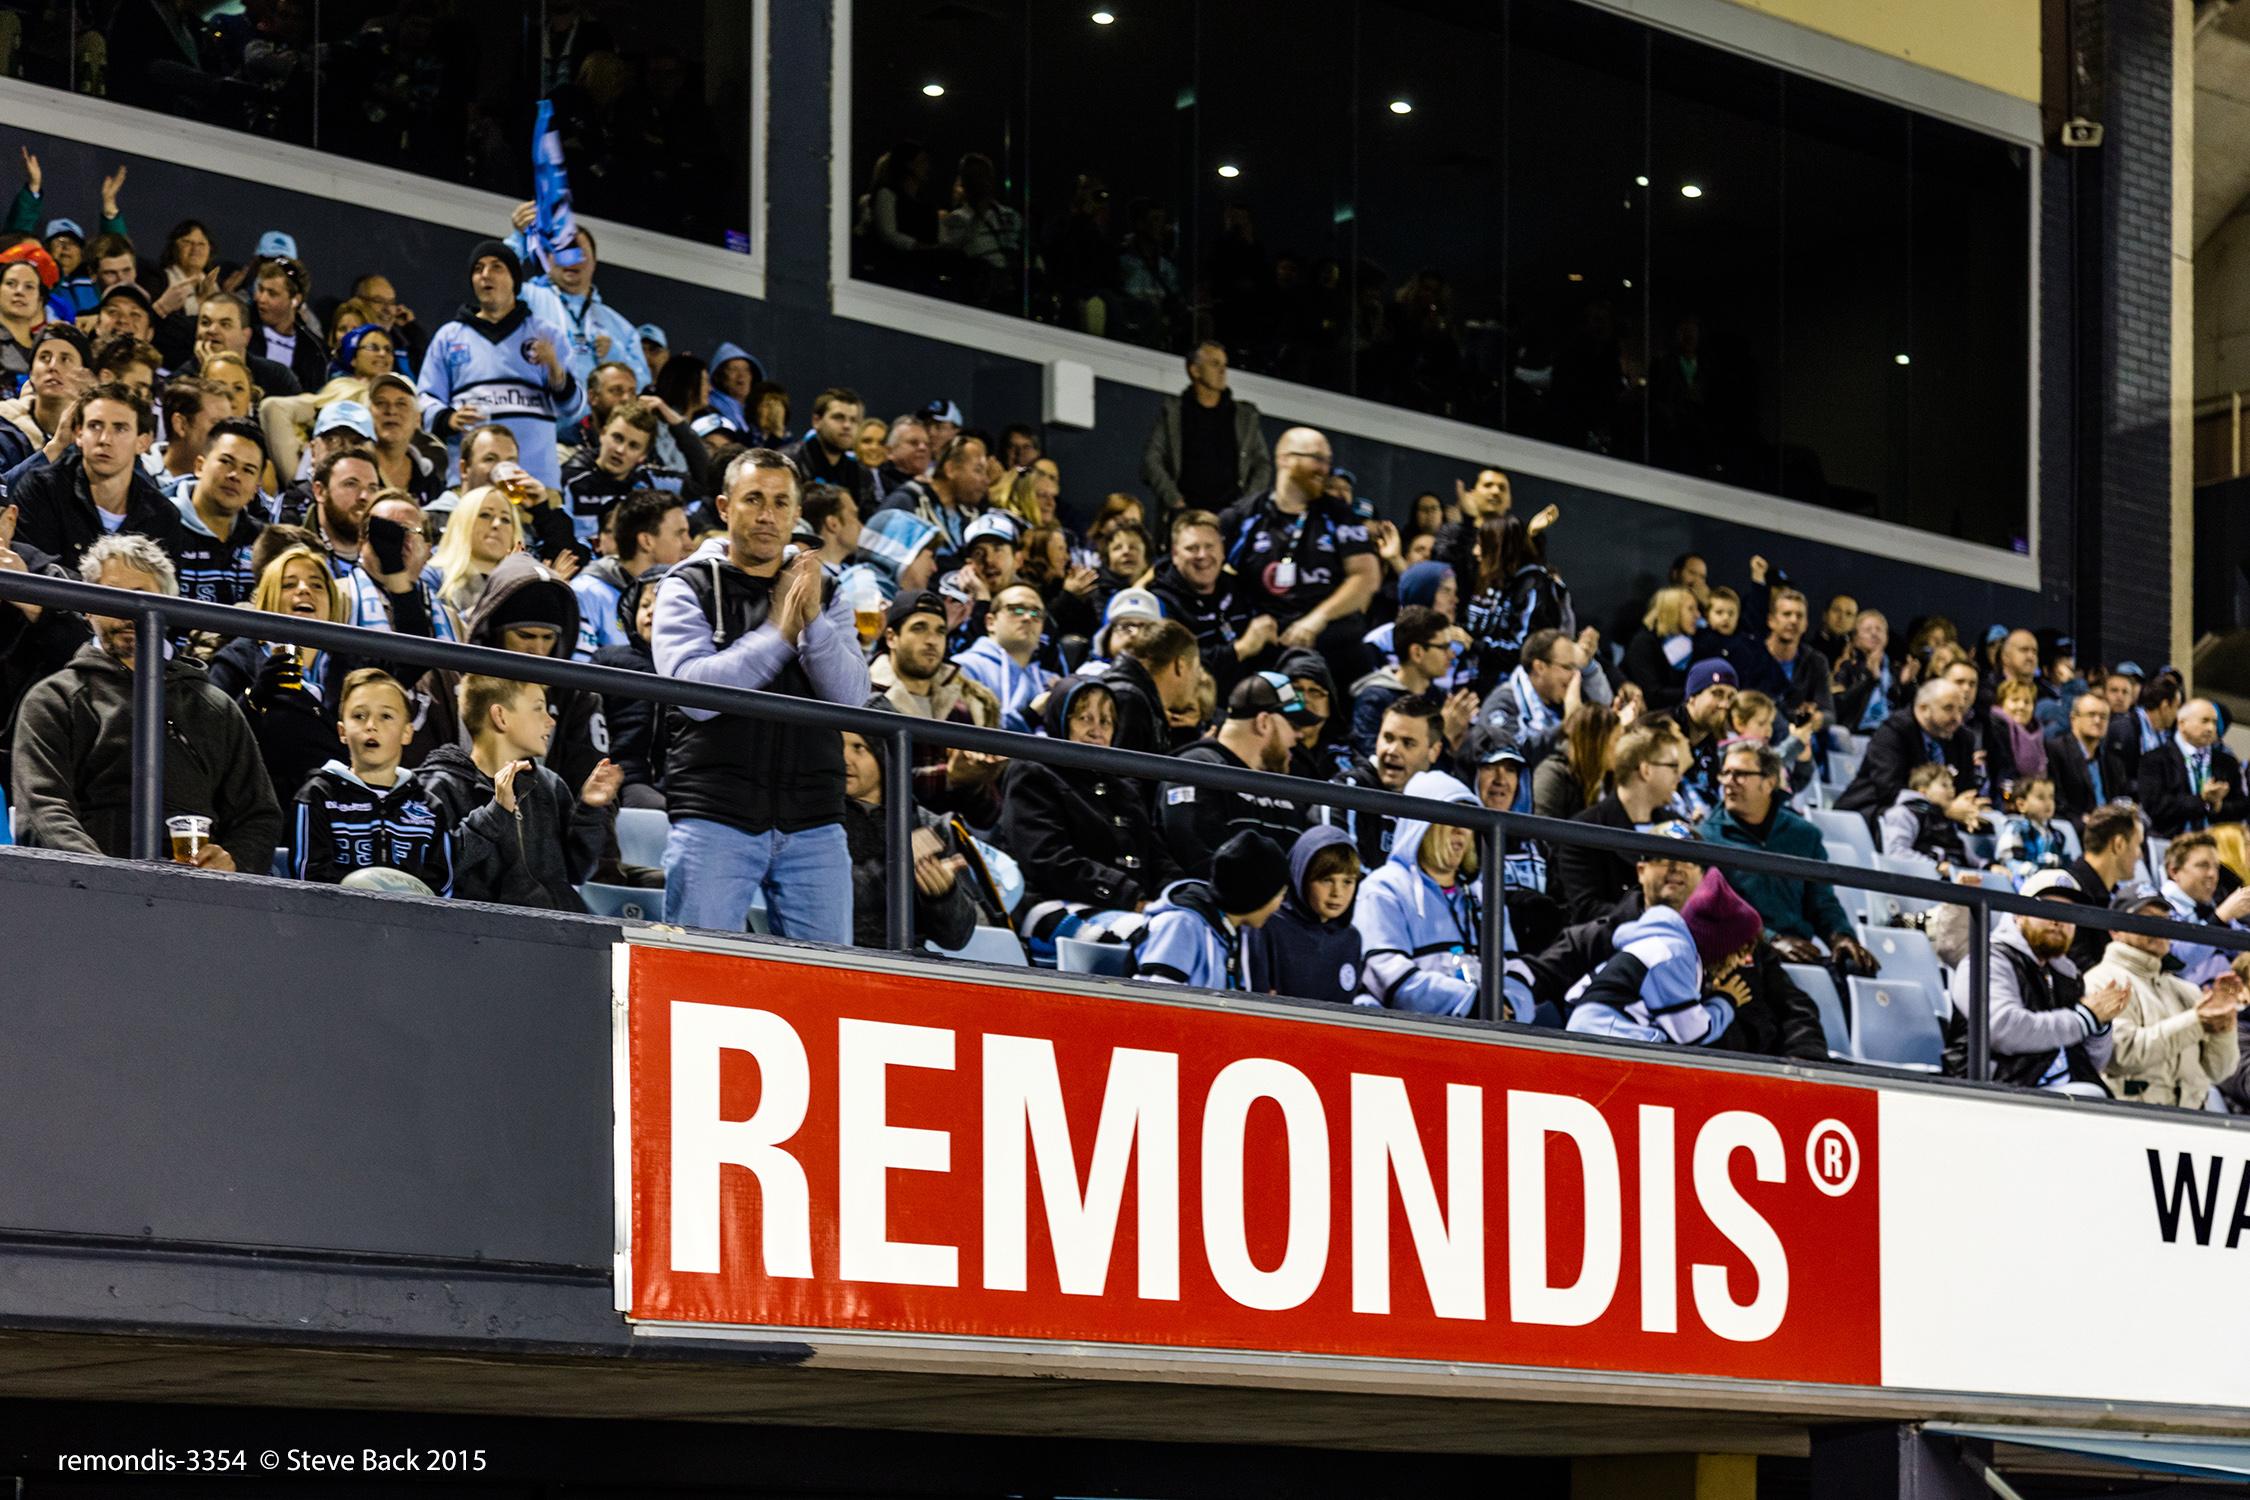 remondis-3354.jpg